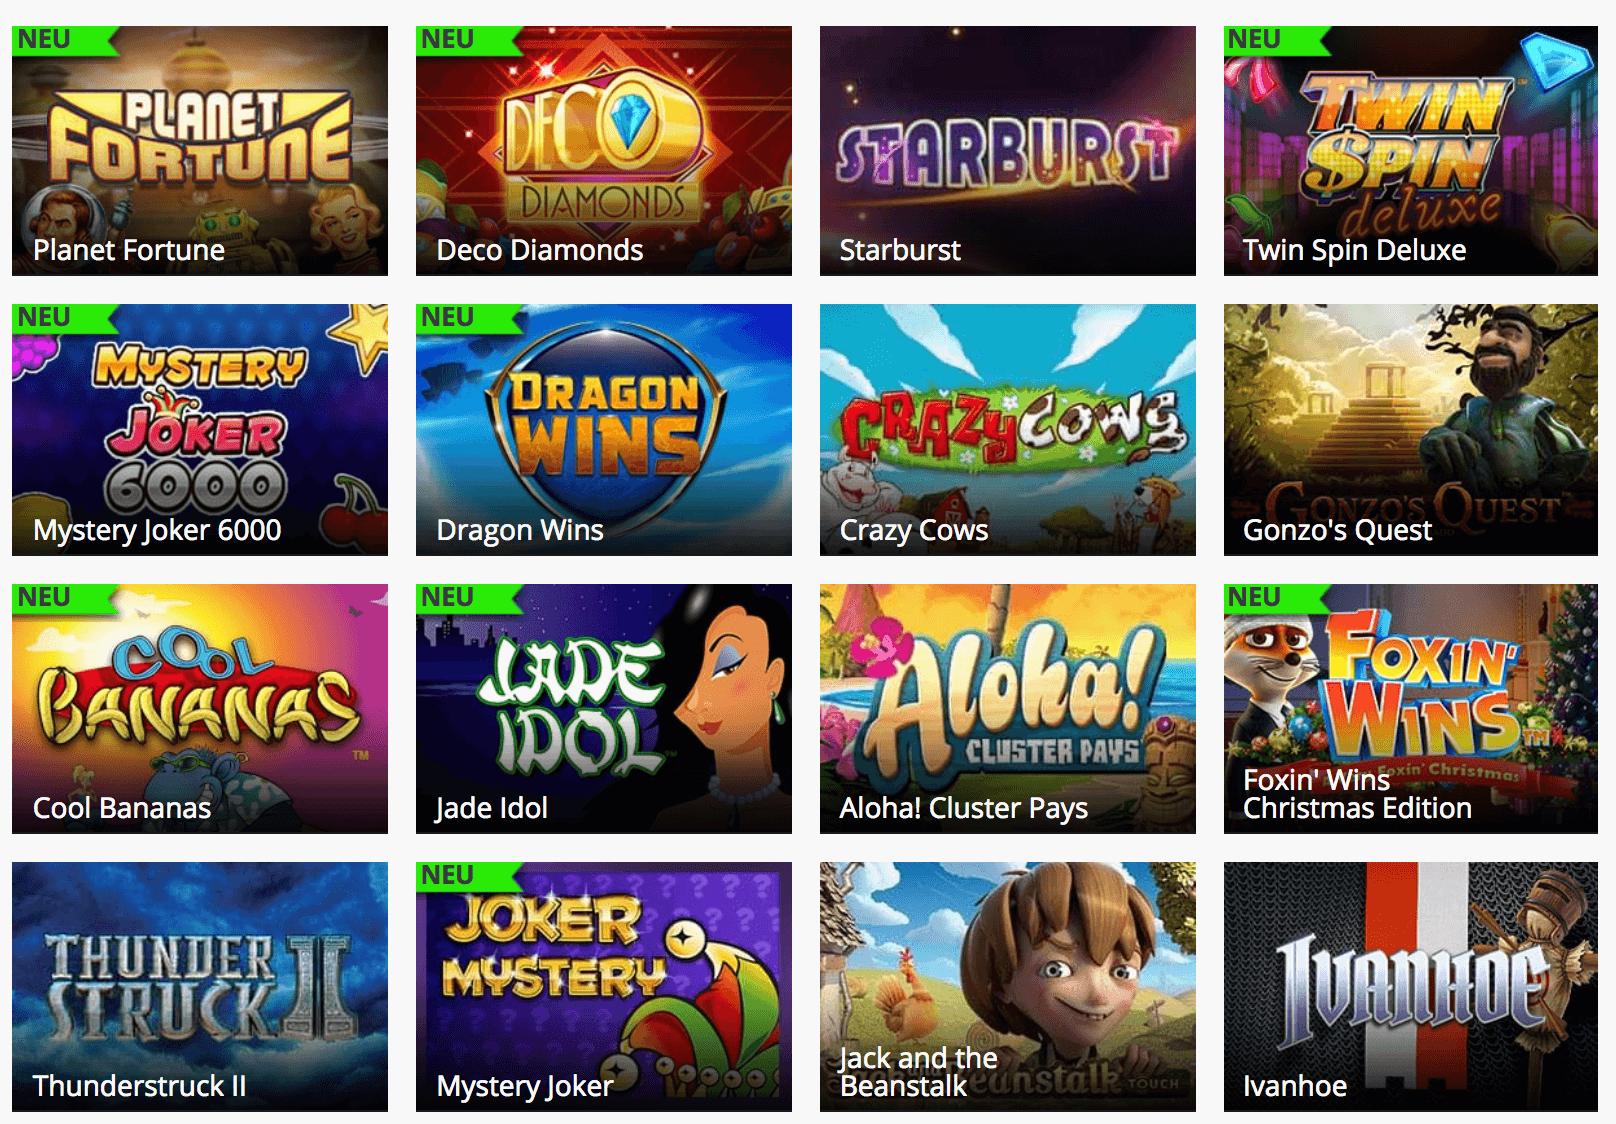 Casino Spiele Automaten 254685